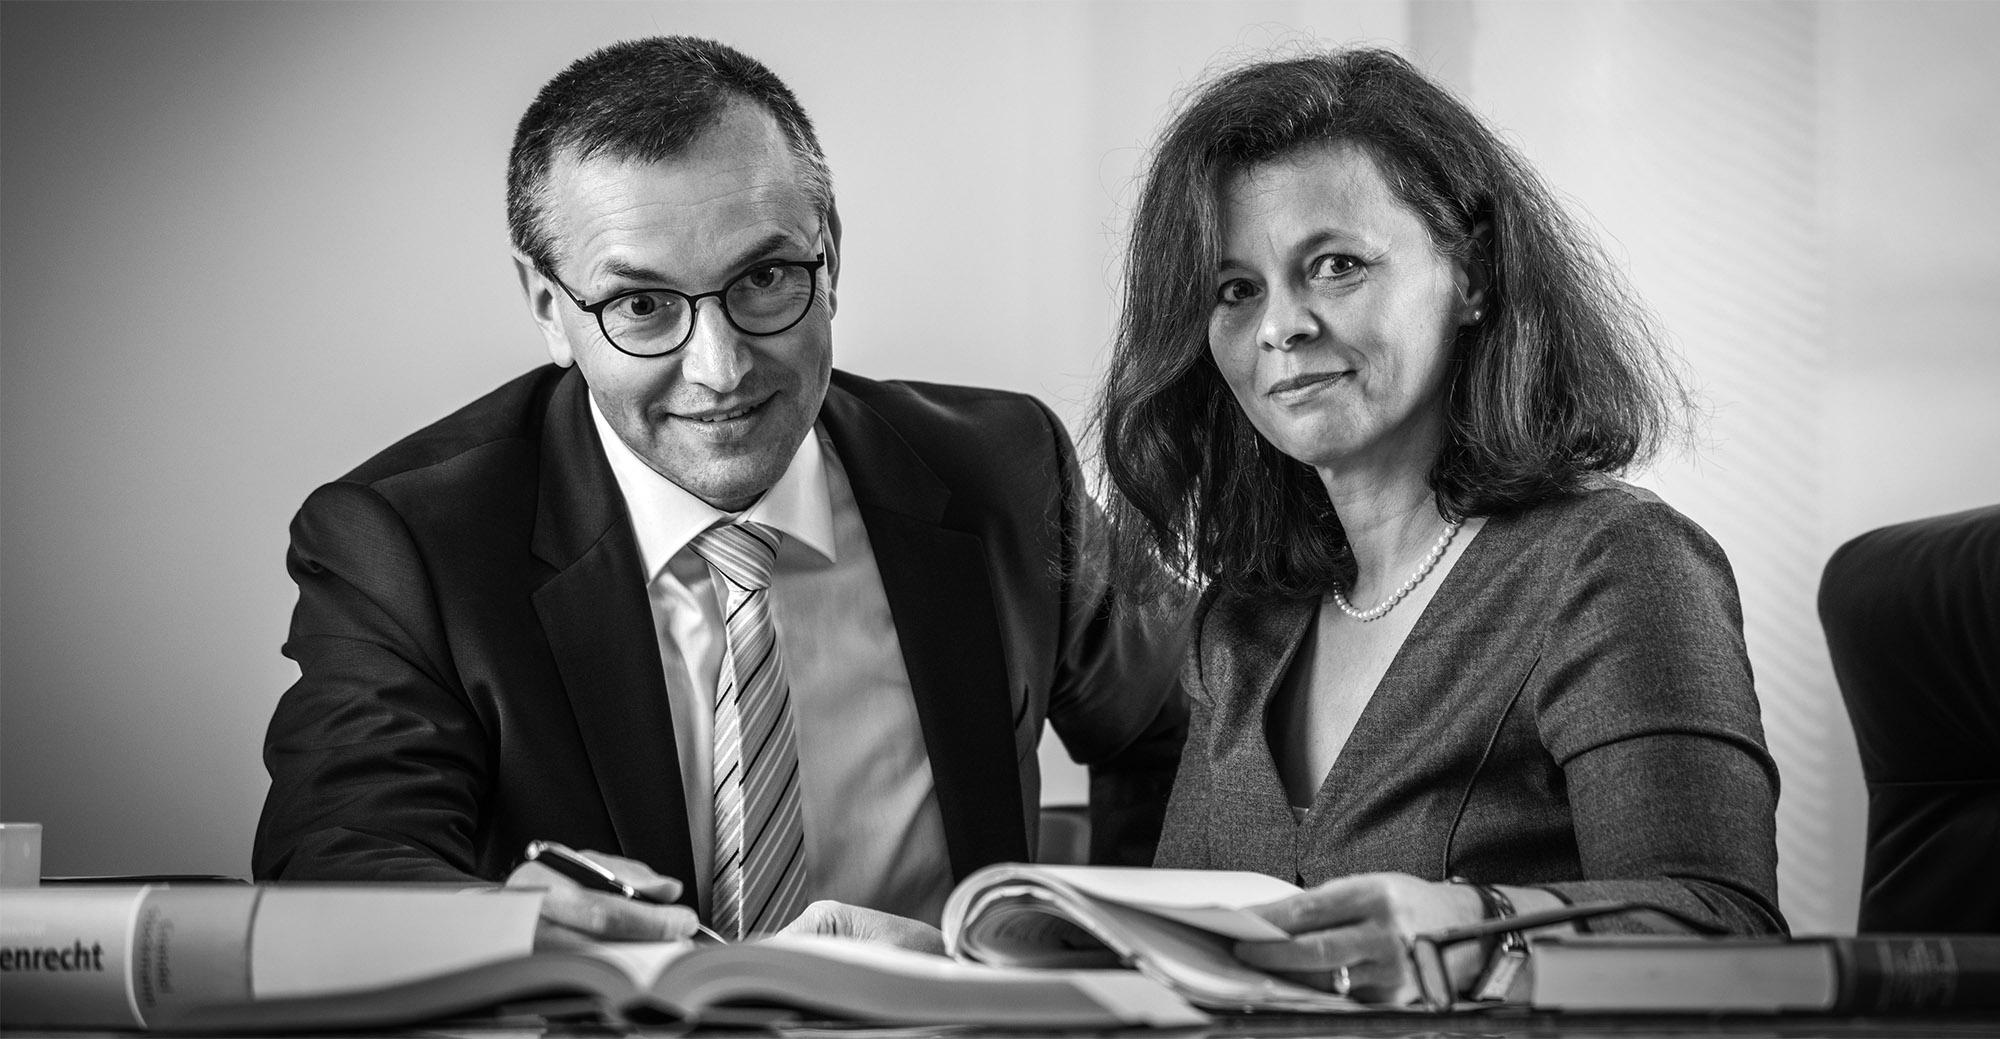 Rechtsanwälte Kade und Kade